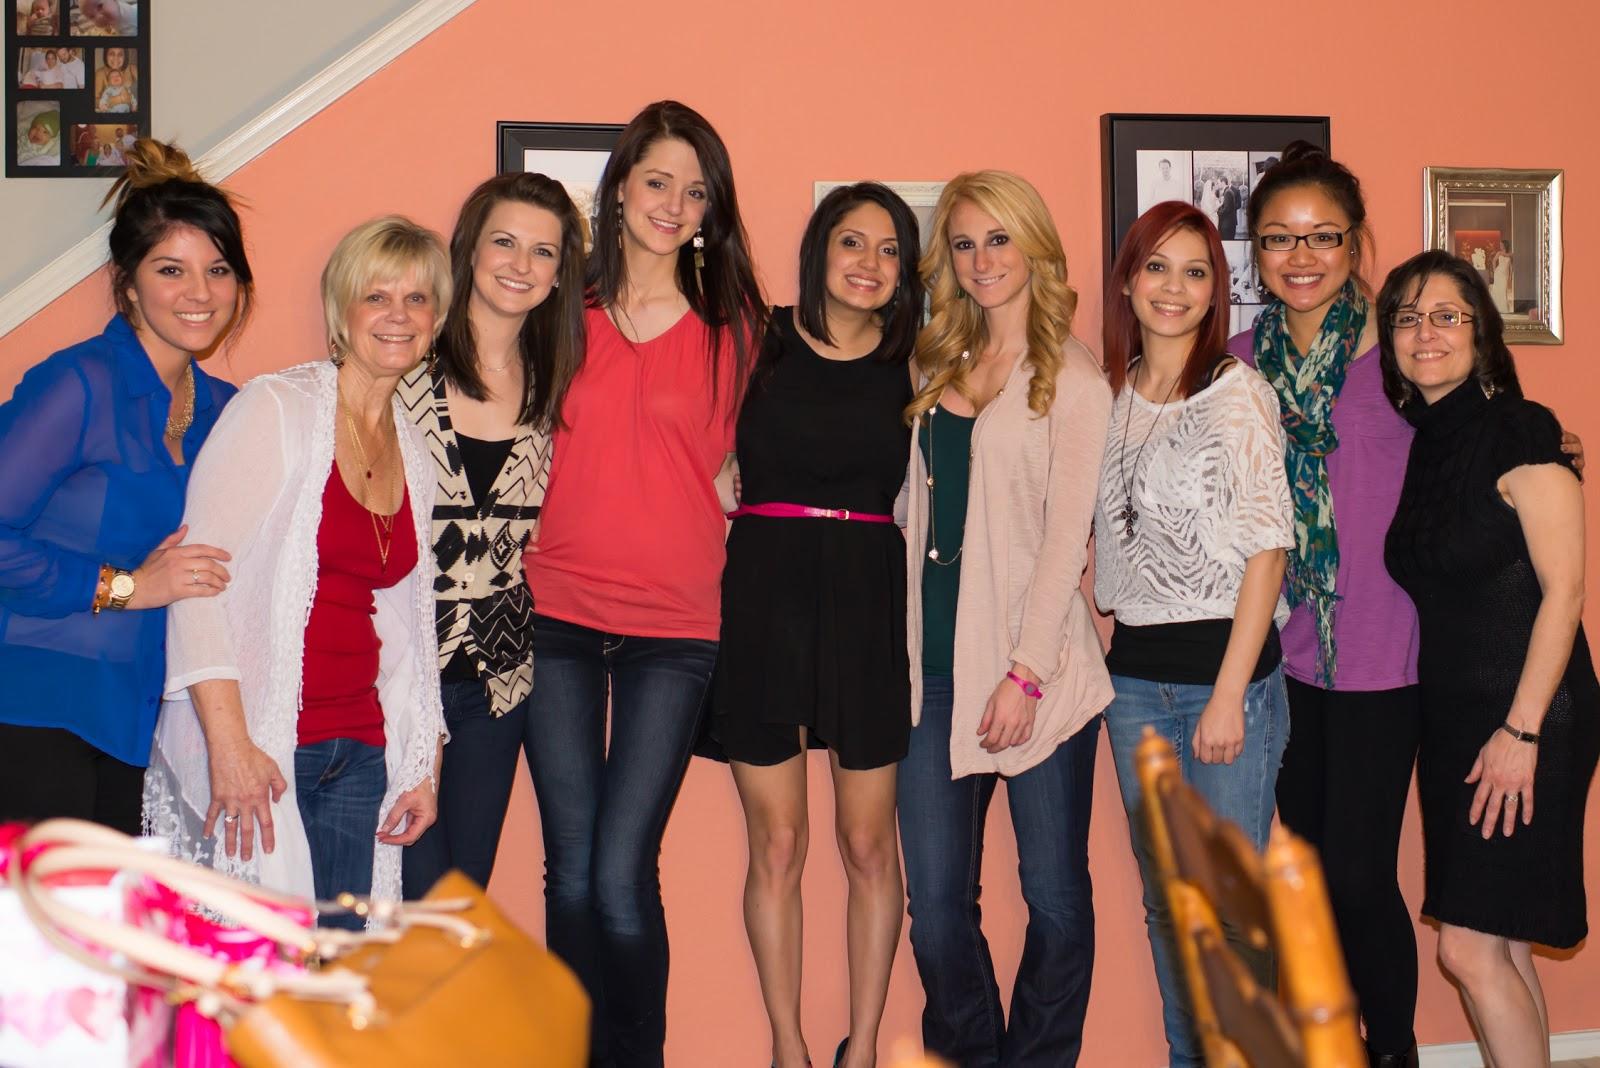 Spring Break Party Girls